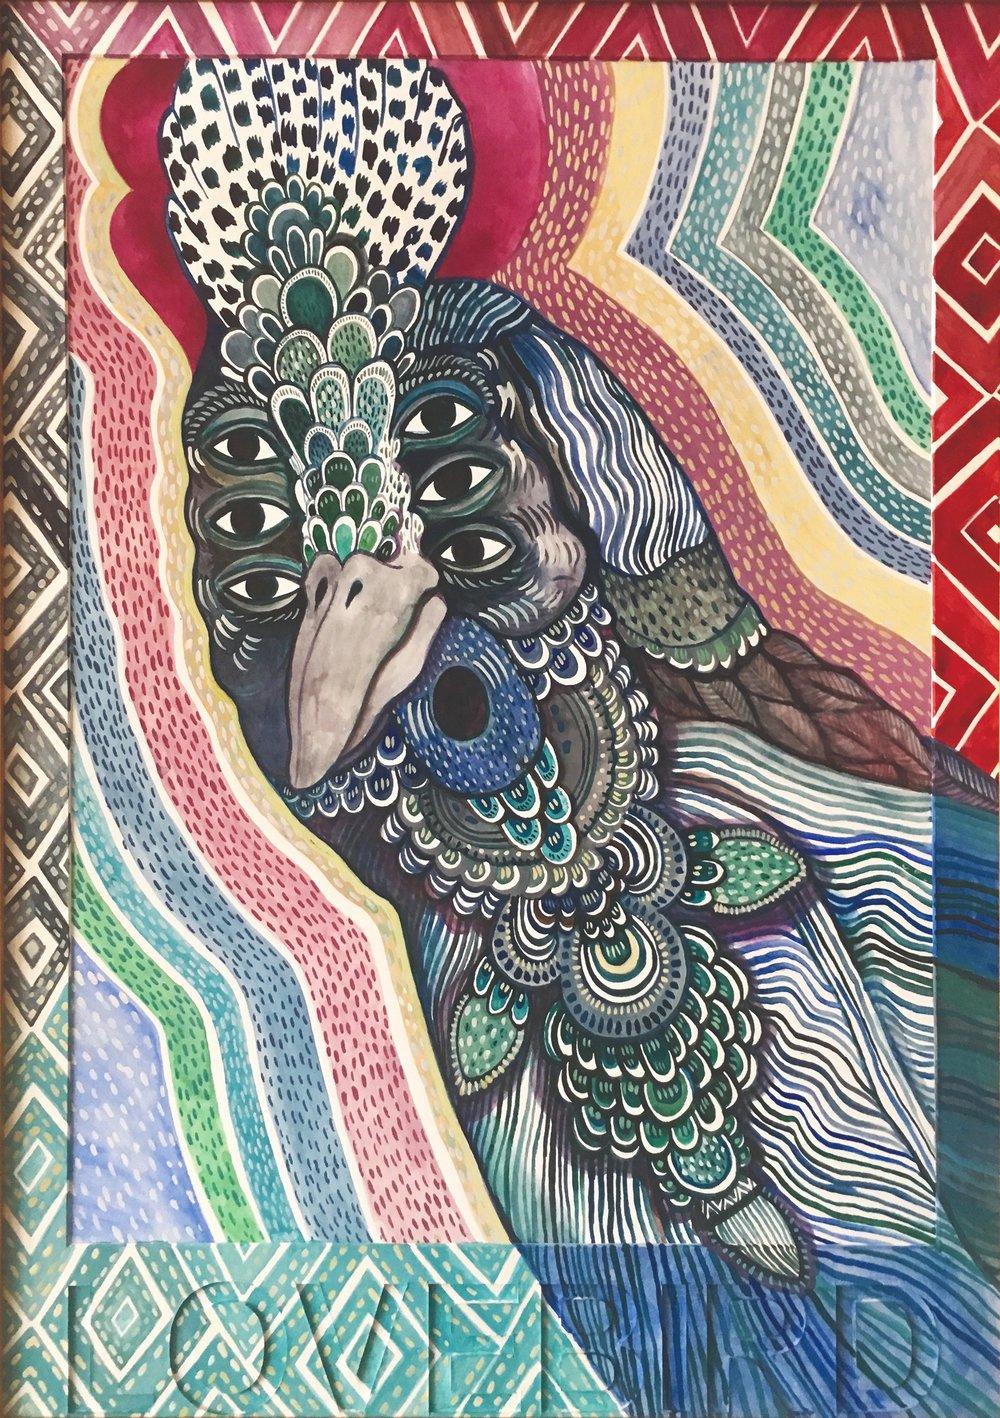 CECILIA FOGELBERG  LOVEBIRD (six eyes) , 2019 gouache and watercolour on 100% cotton rag board, framed 61 x 43 cm